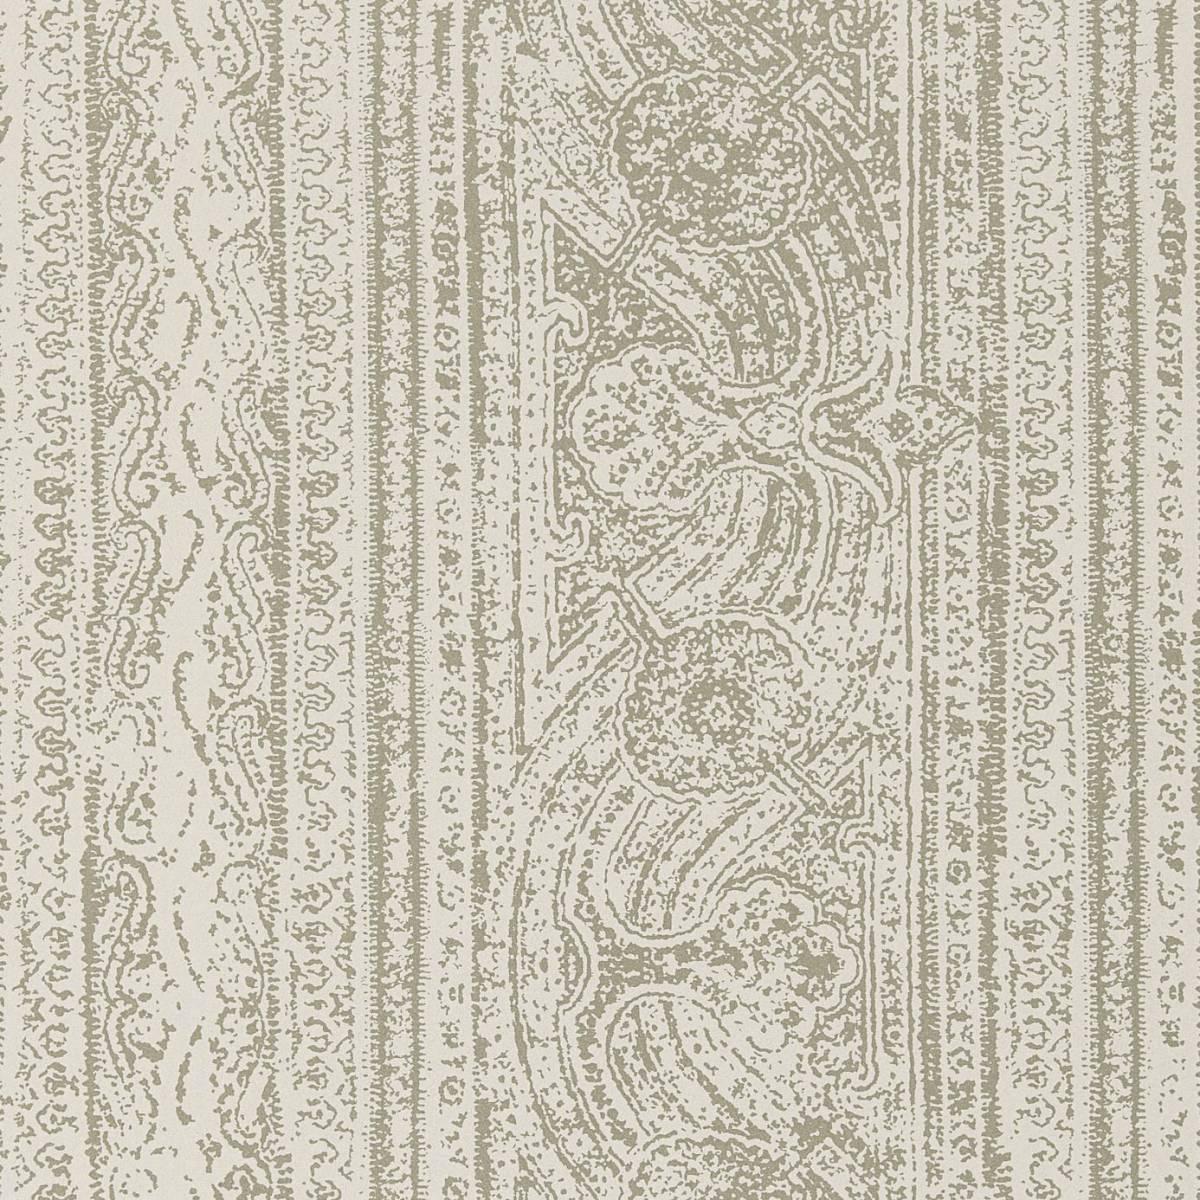 odisha wallpaper - almond/mink (111253) - harlequin palmetto